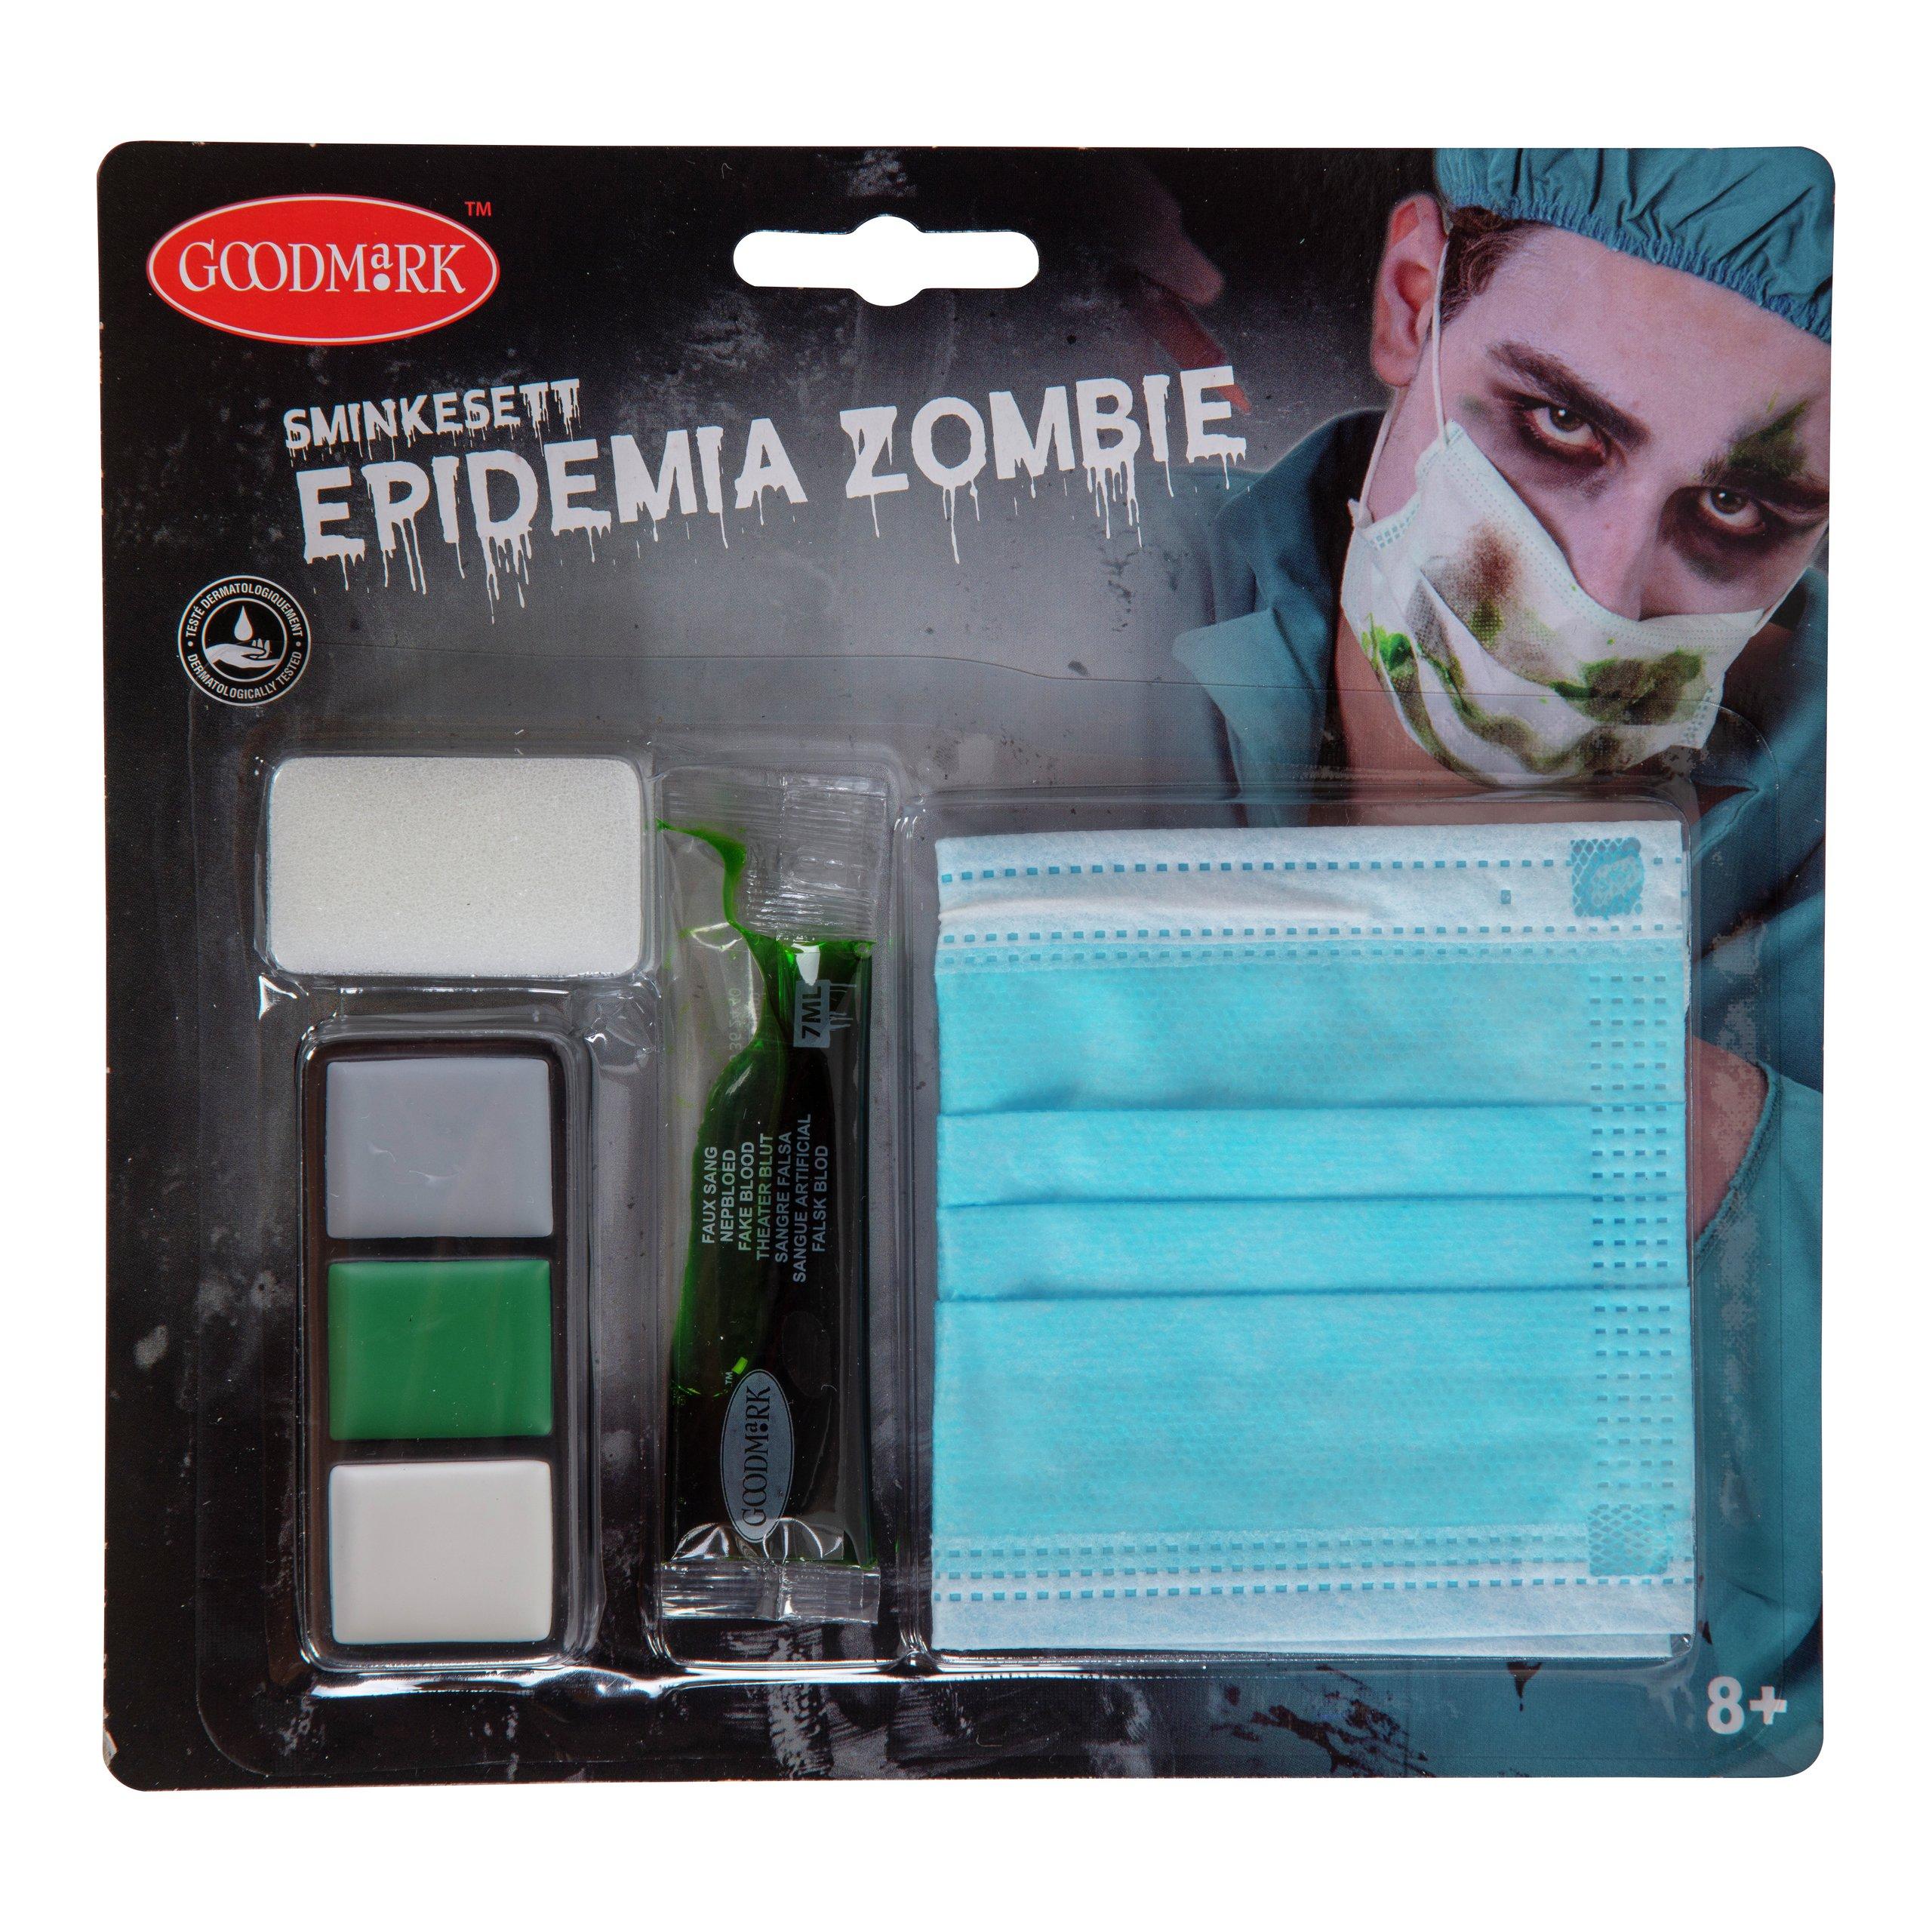 SMINKESETT EPIDEMIA ZOMBIE -102084